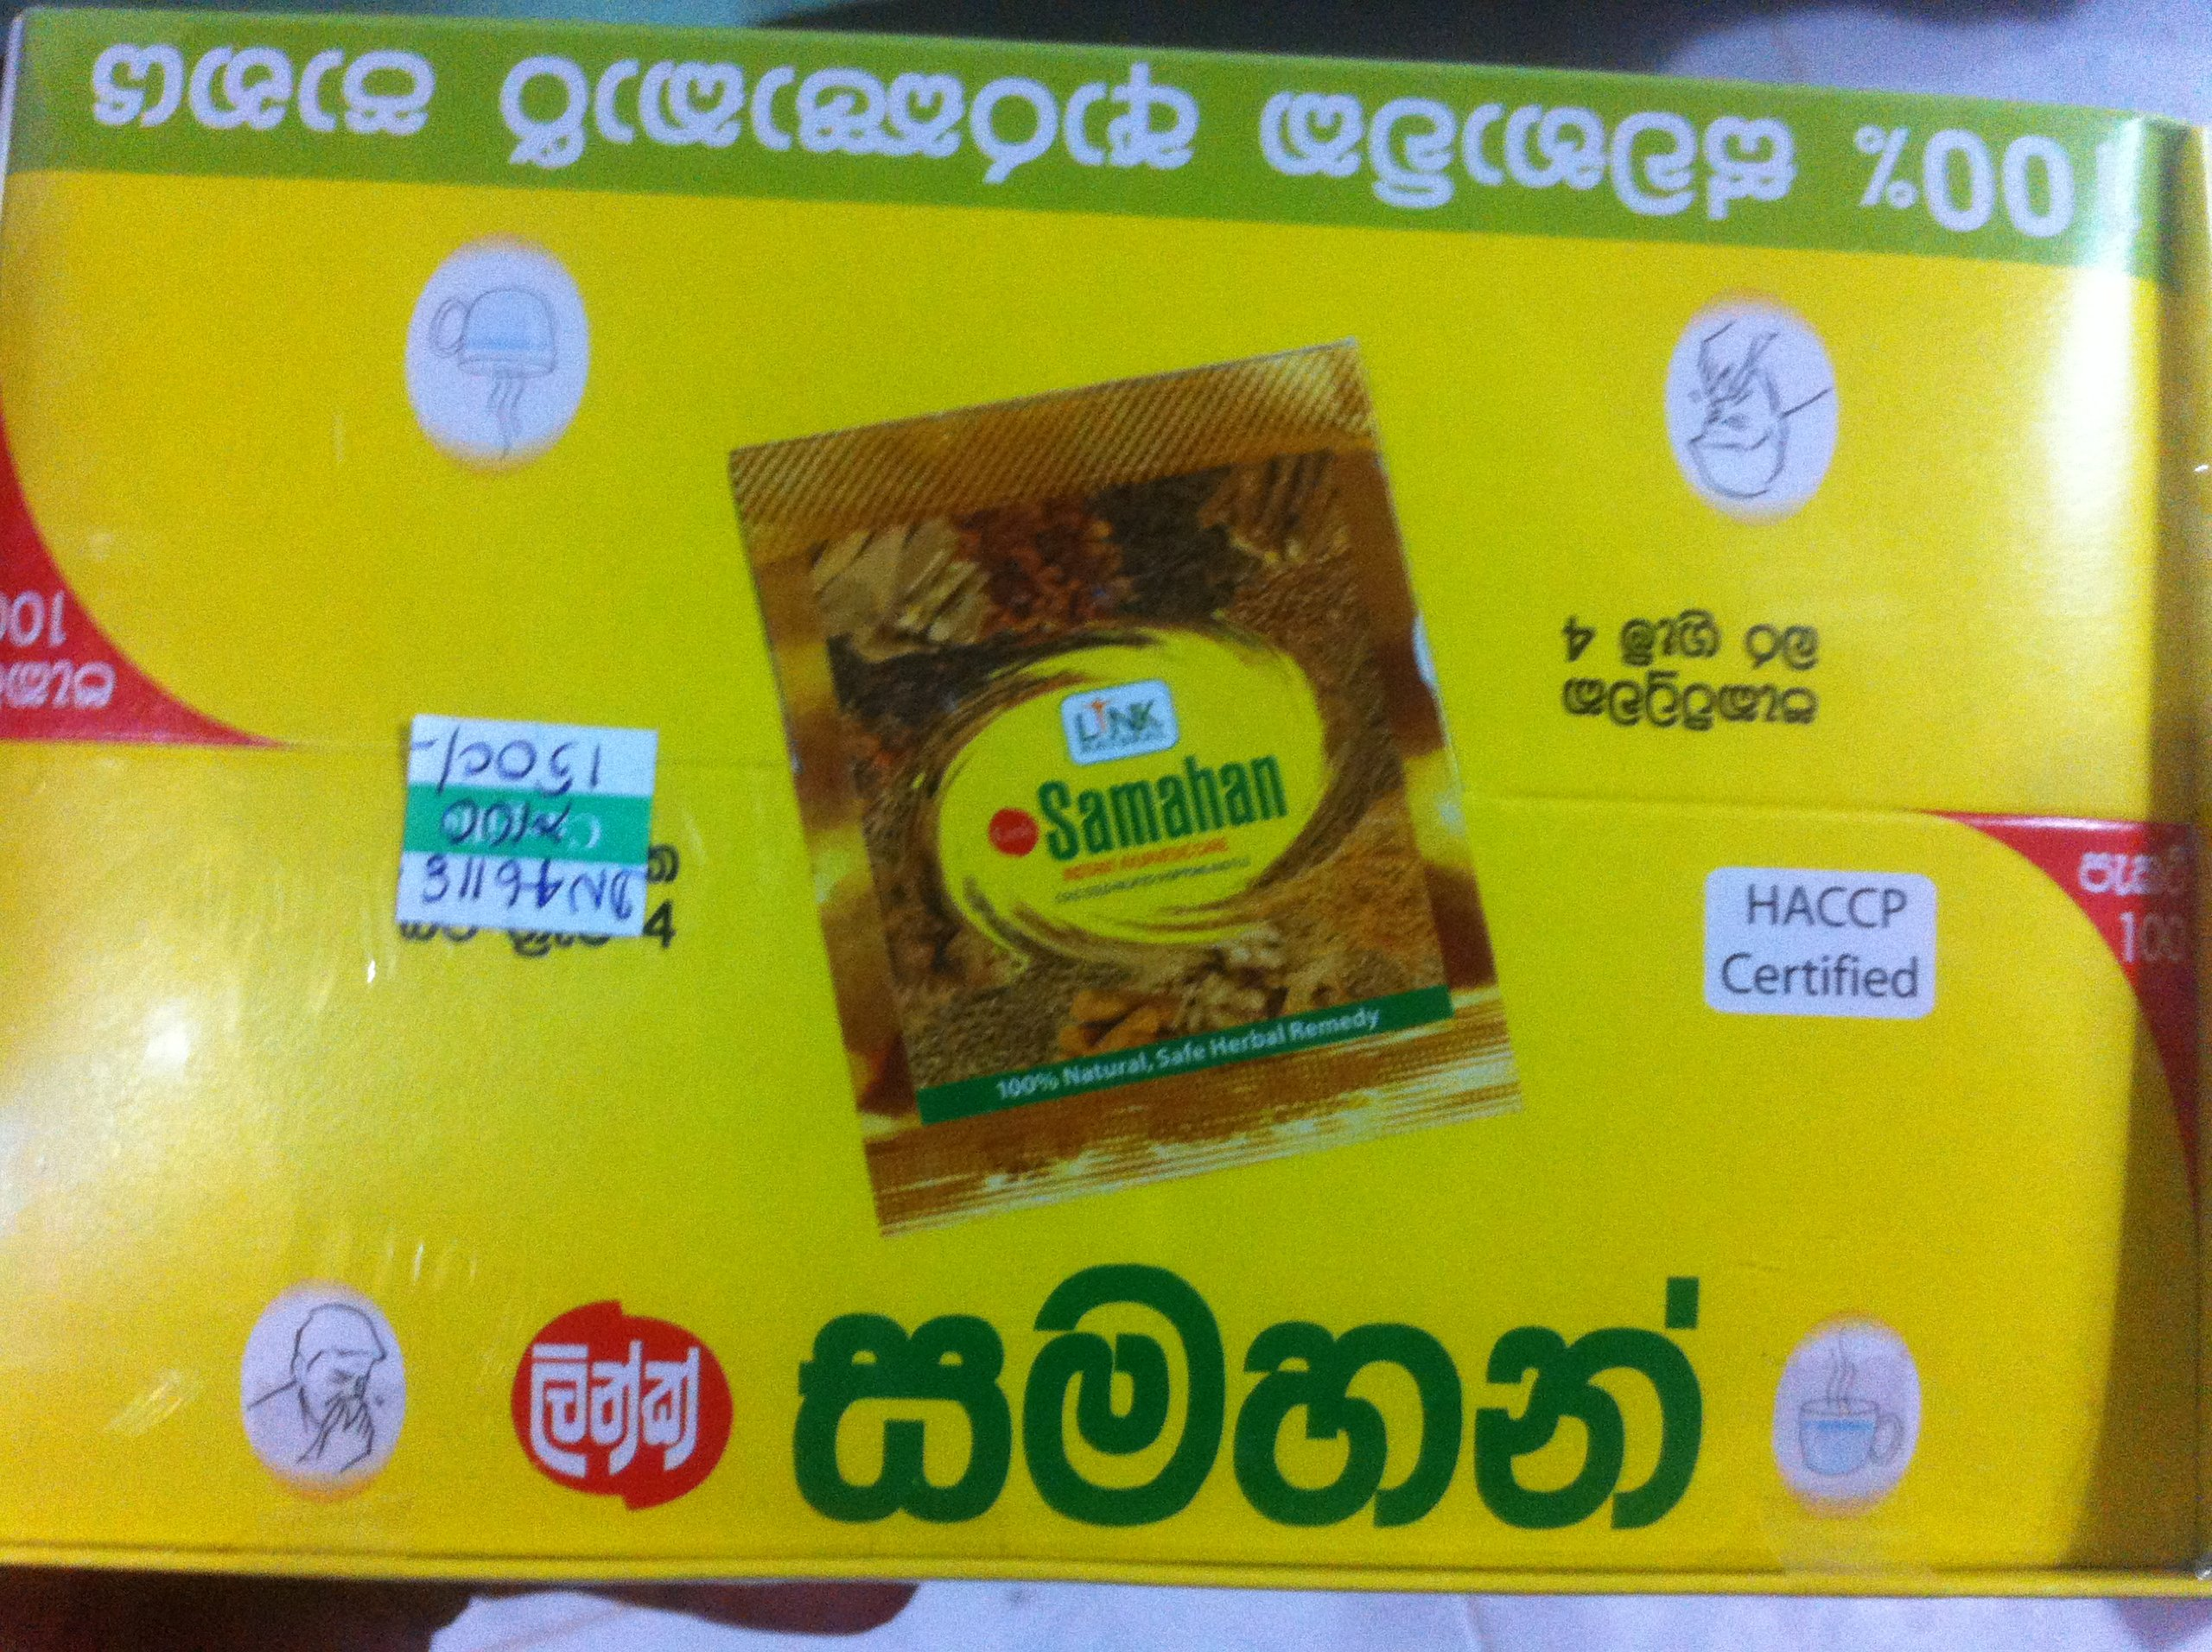 Samahan-Ayurveda-Kruter-Ceylon-Tee-100-paket